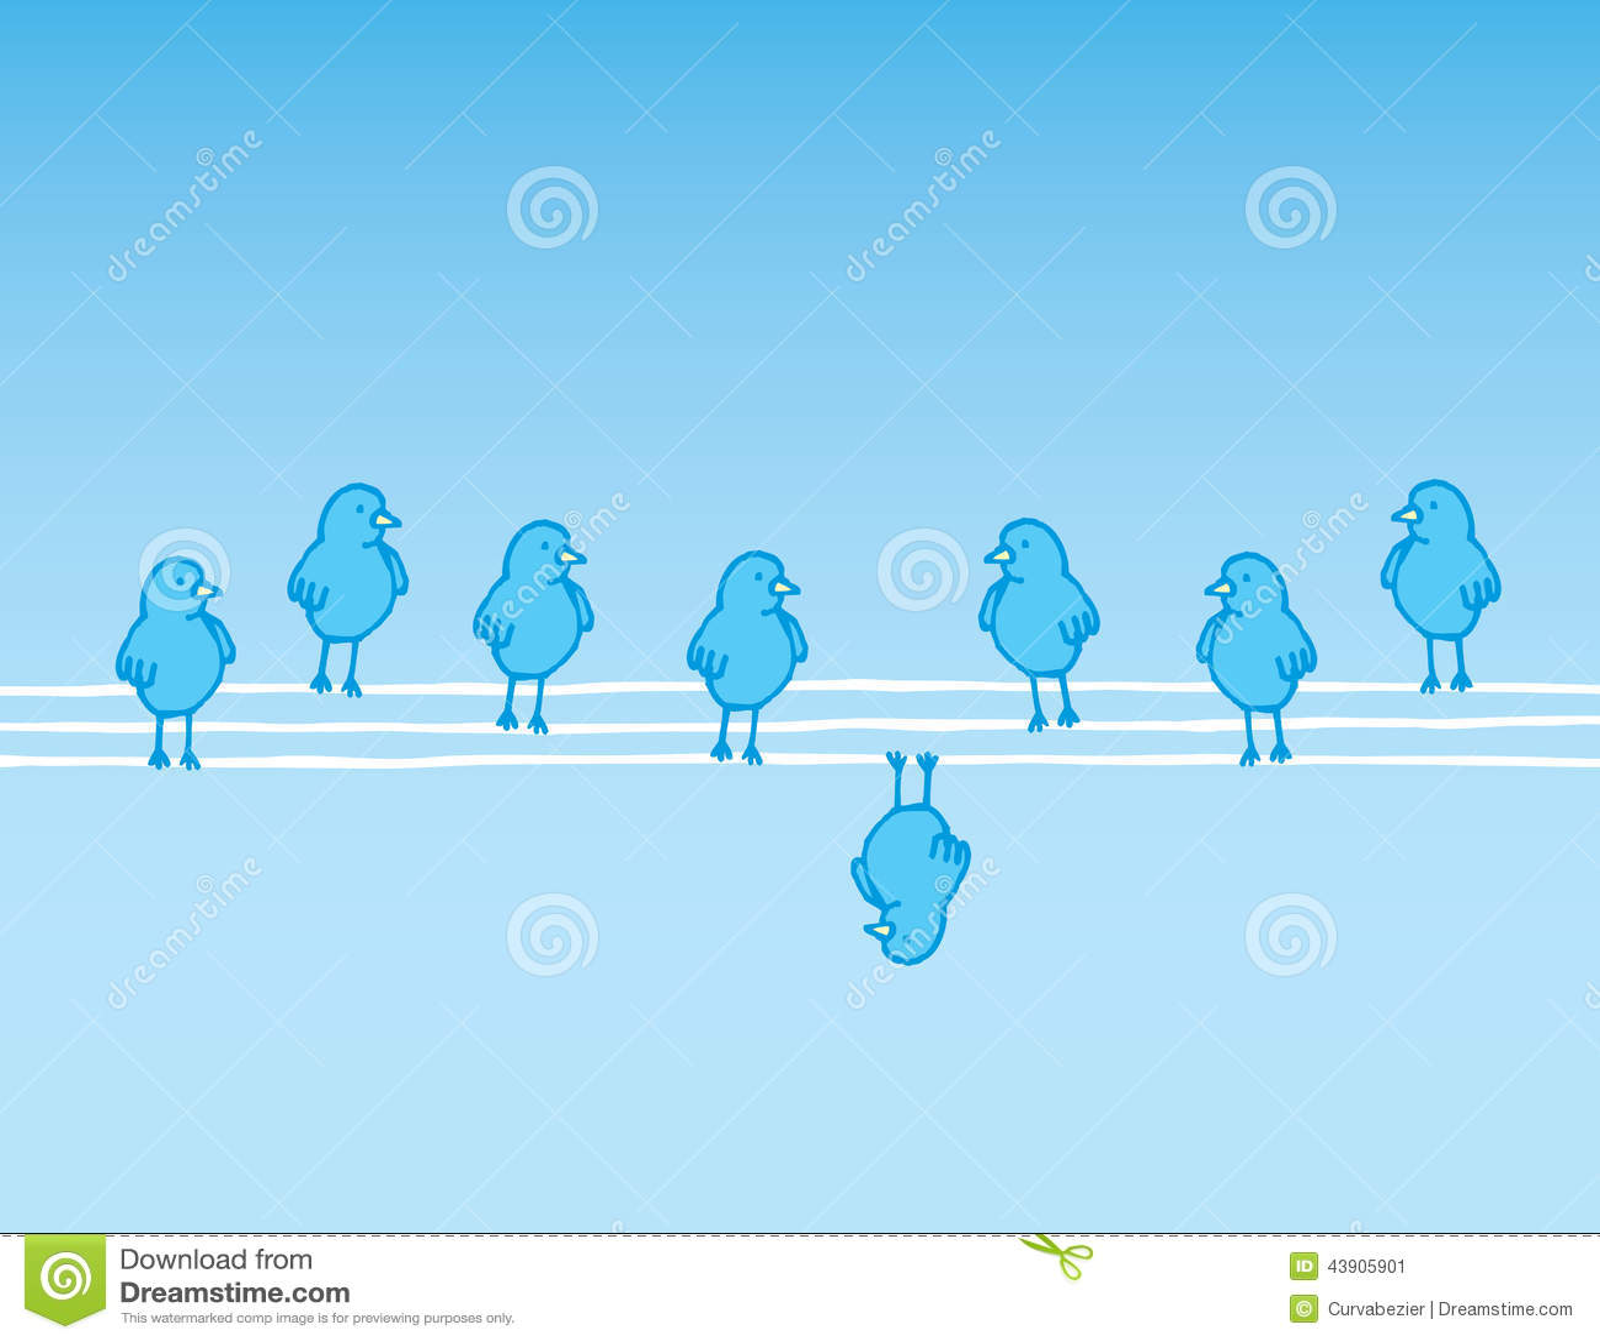 Rebel Bird Hanging Upside Down Stock Vector Illustration Of